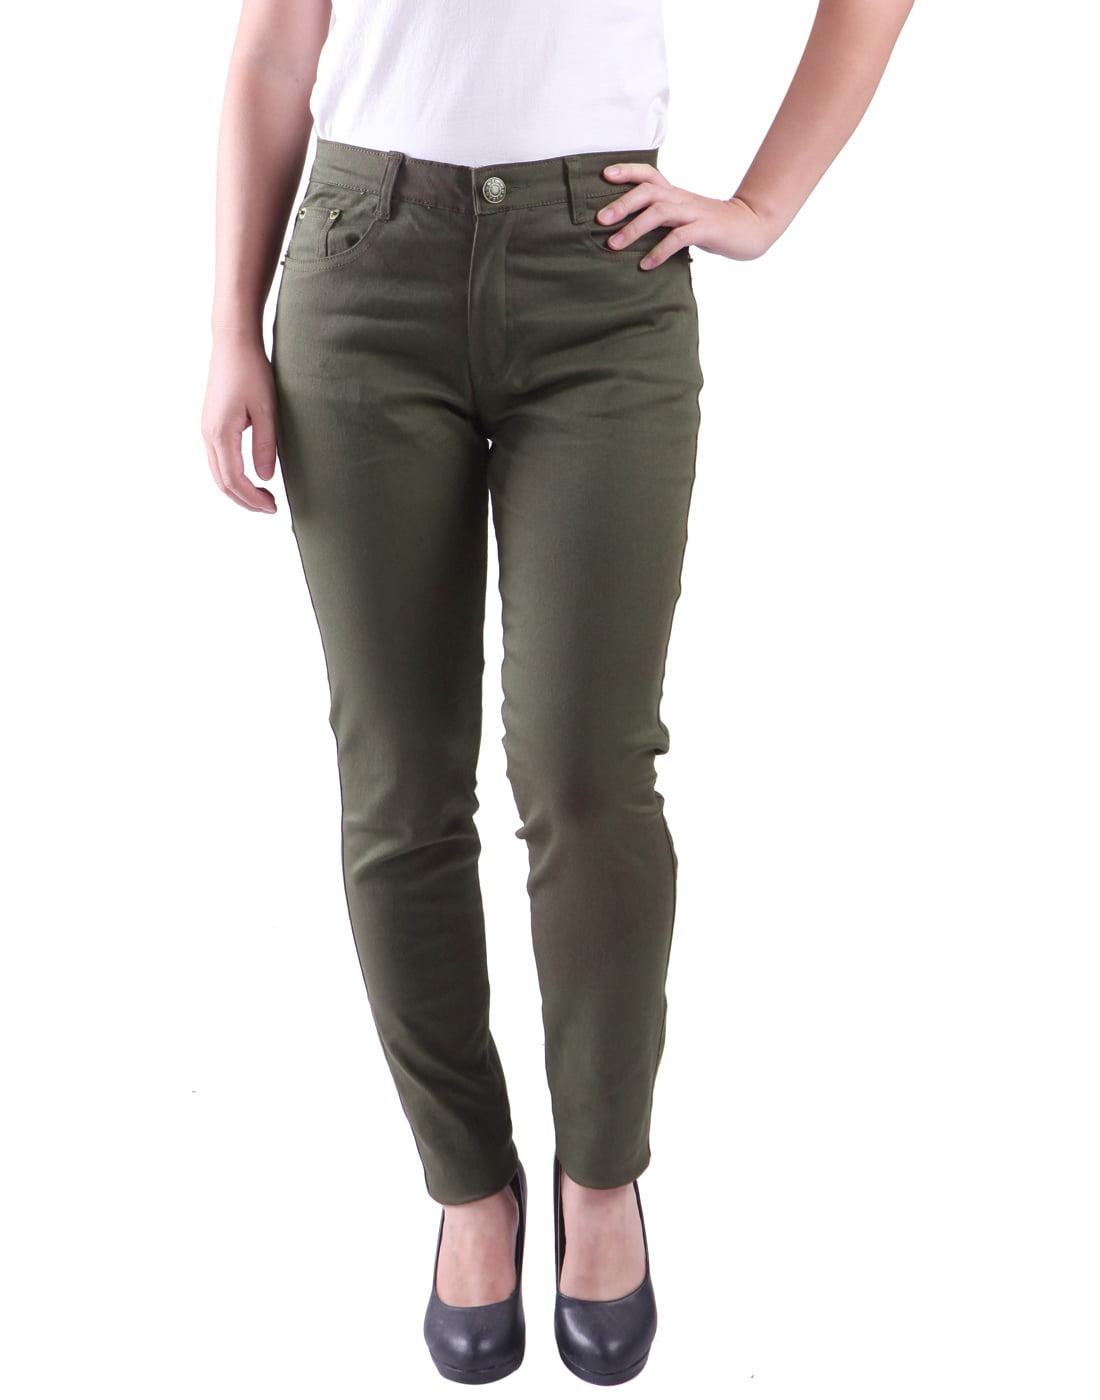 Women's Jeans Jeggings Five Pocket Stretch Denim Pants (Olive Green - Small)